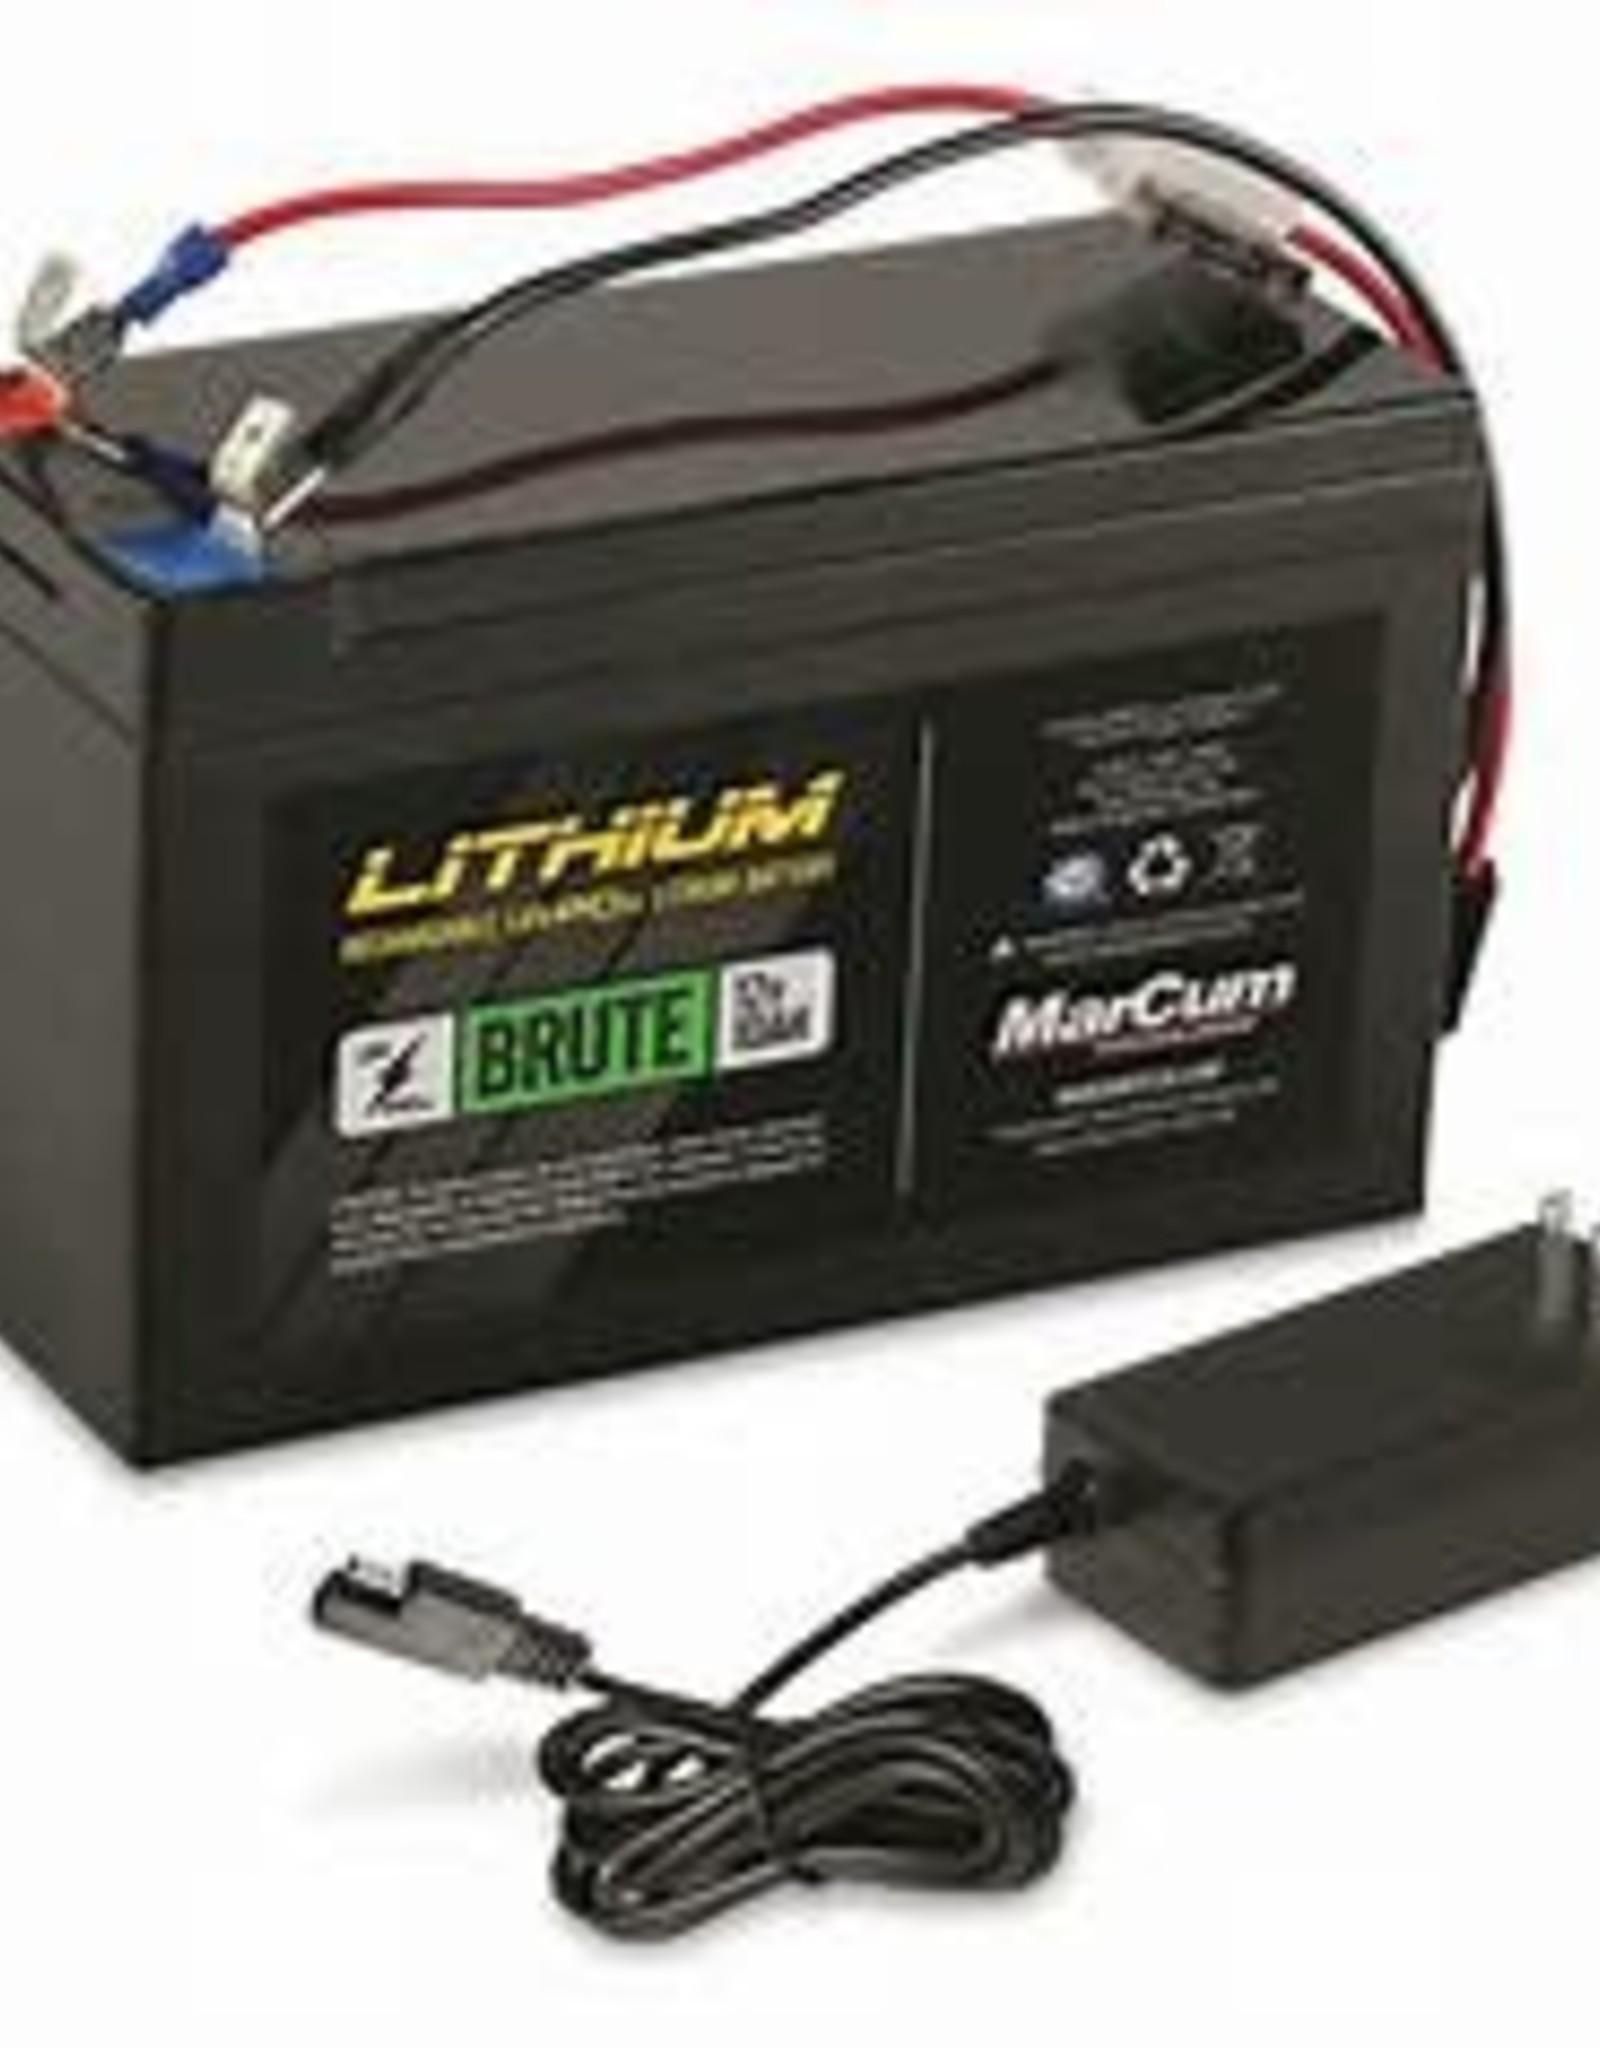 Marcum 12V 10AH LifePO4 Battery amd 3amp Charger